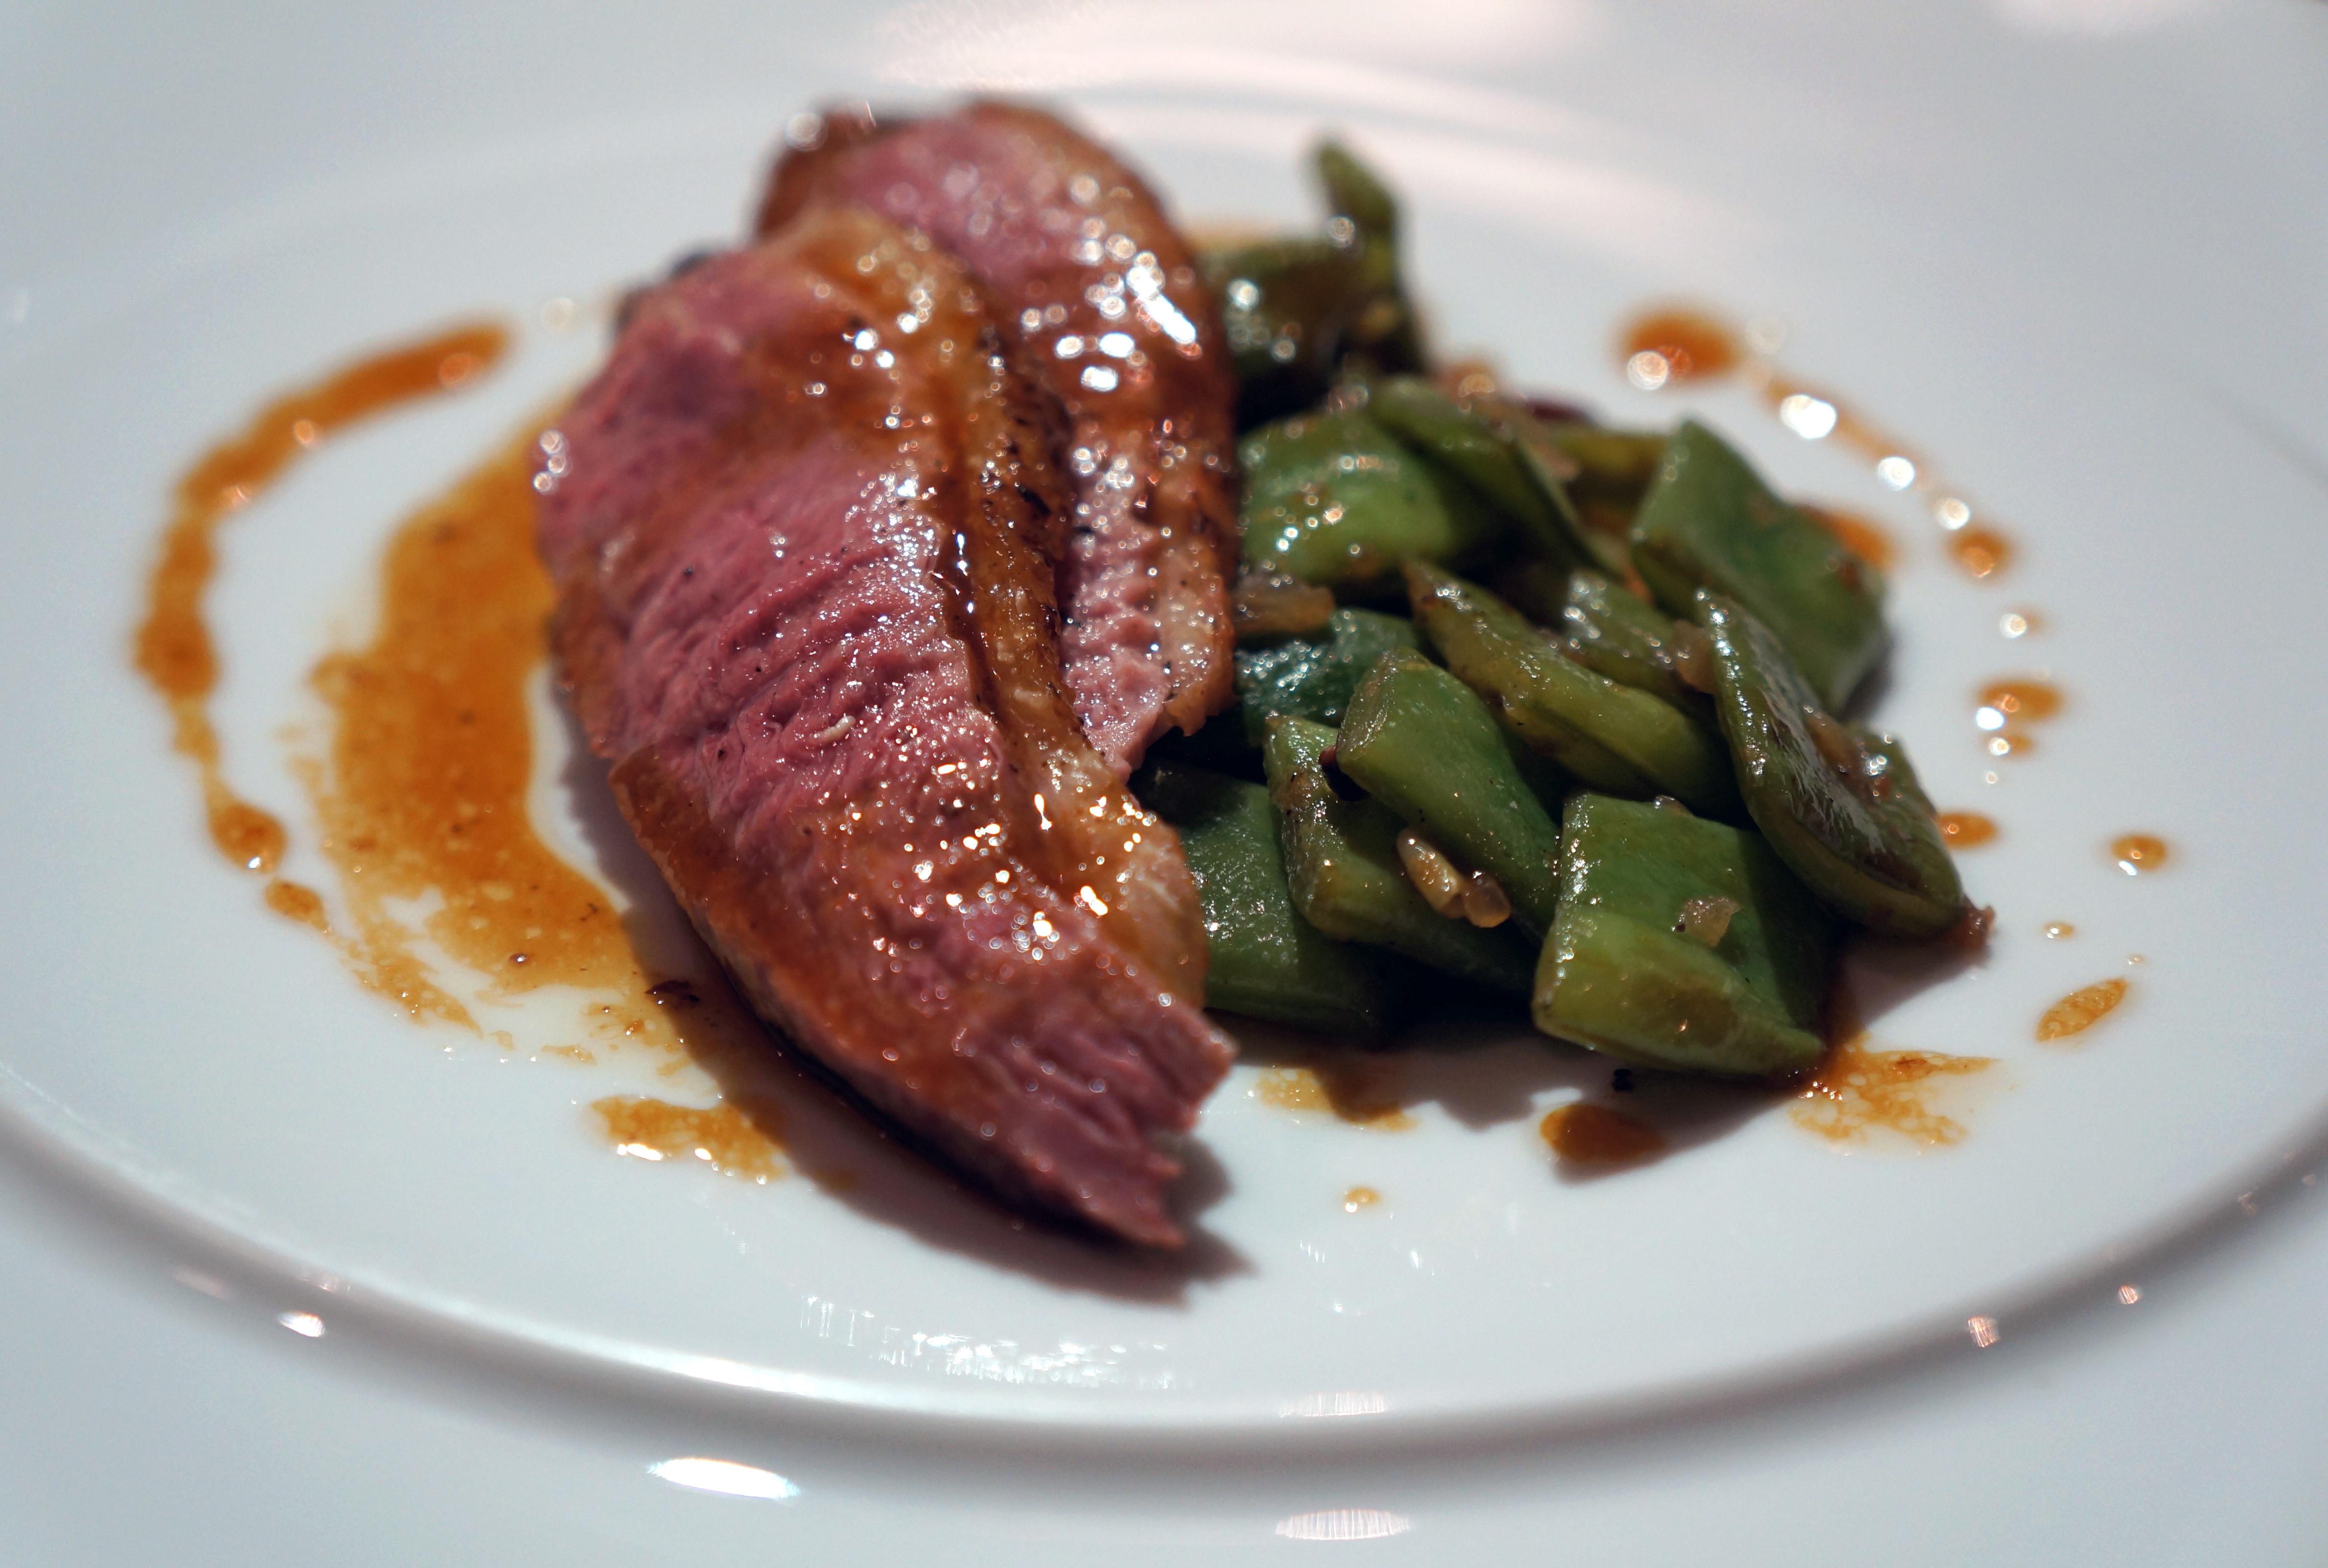 pačji file preliven sopstvenim sosom, blanširana zelena boranija, pinjole